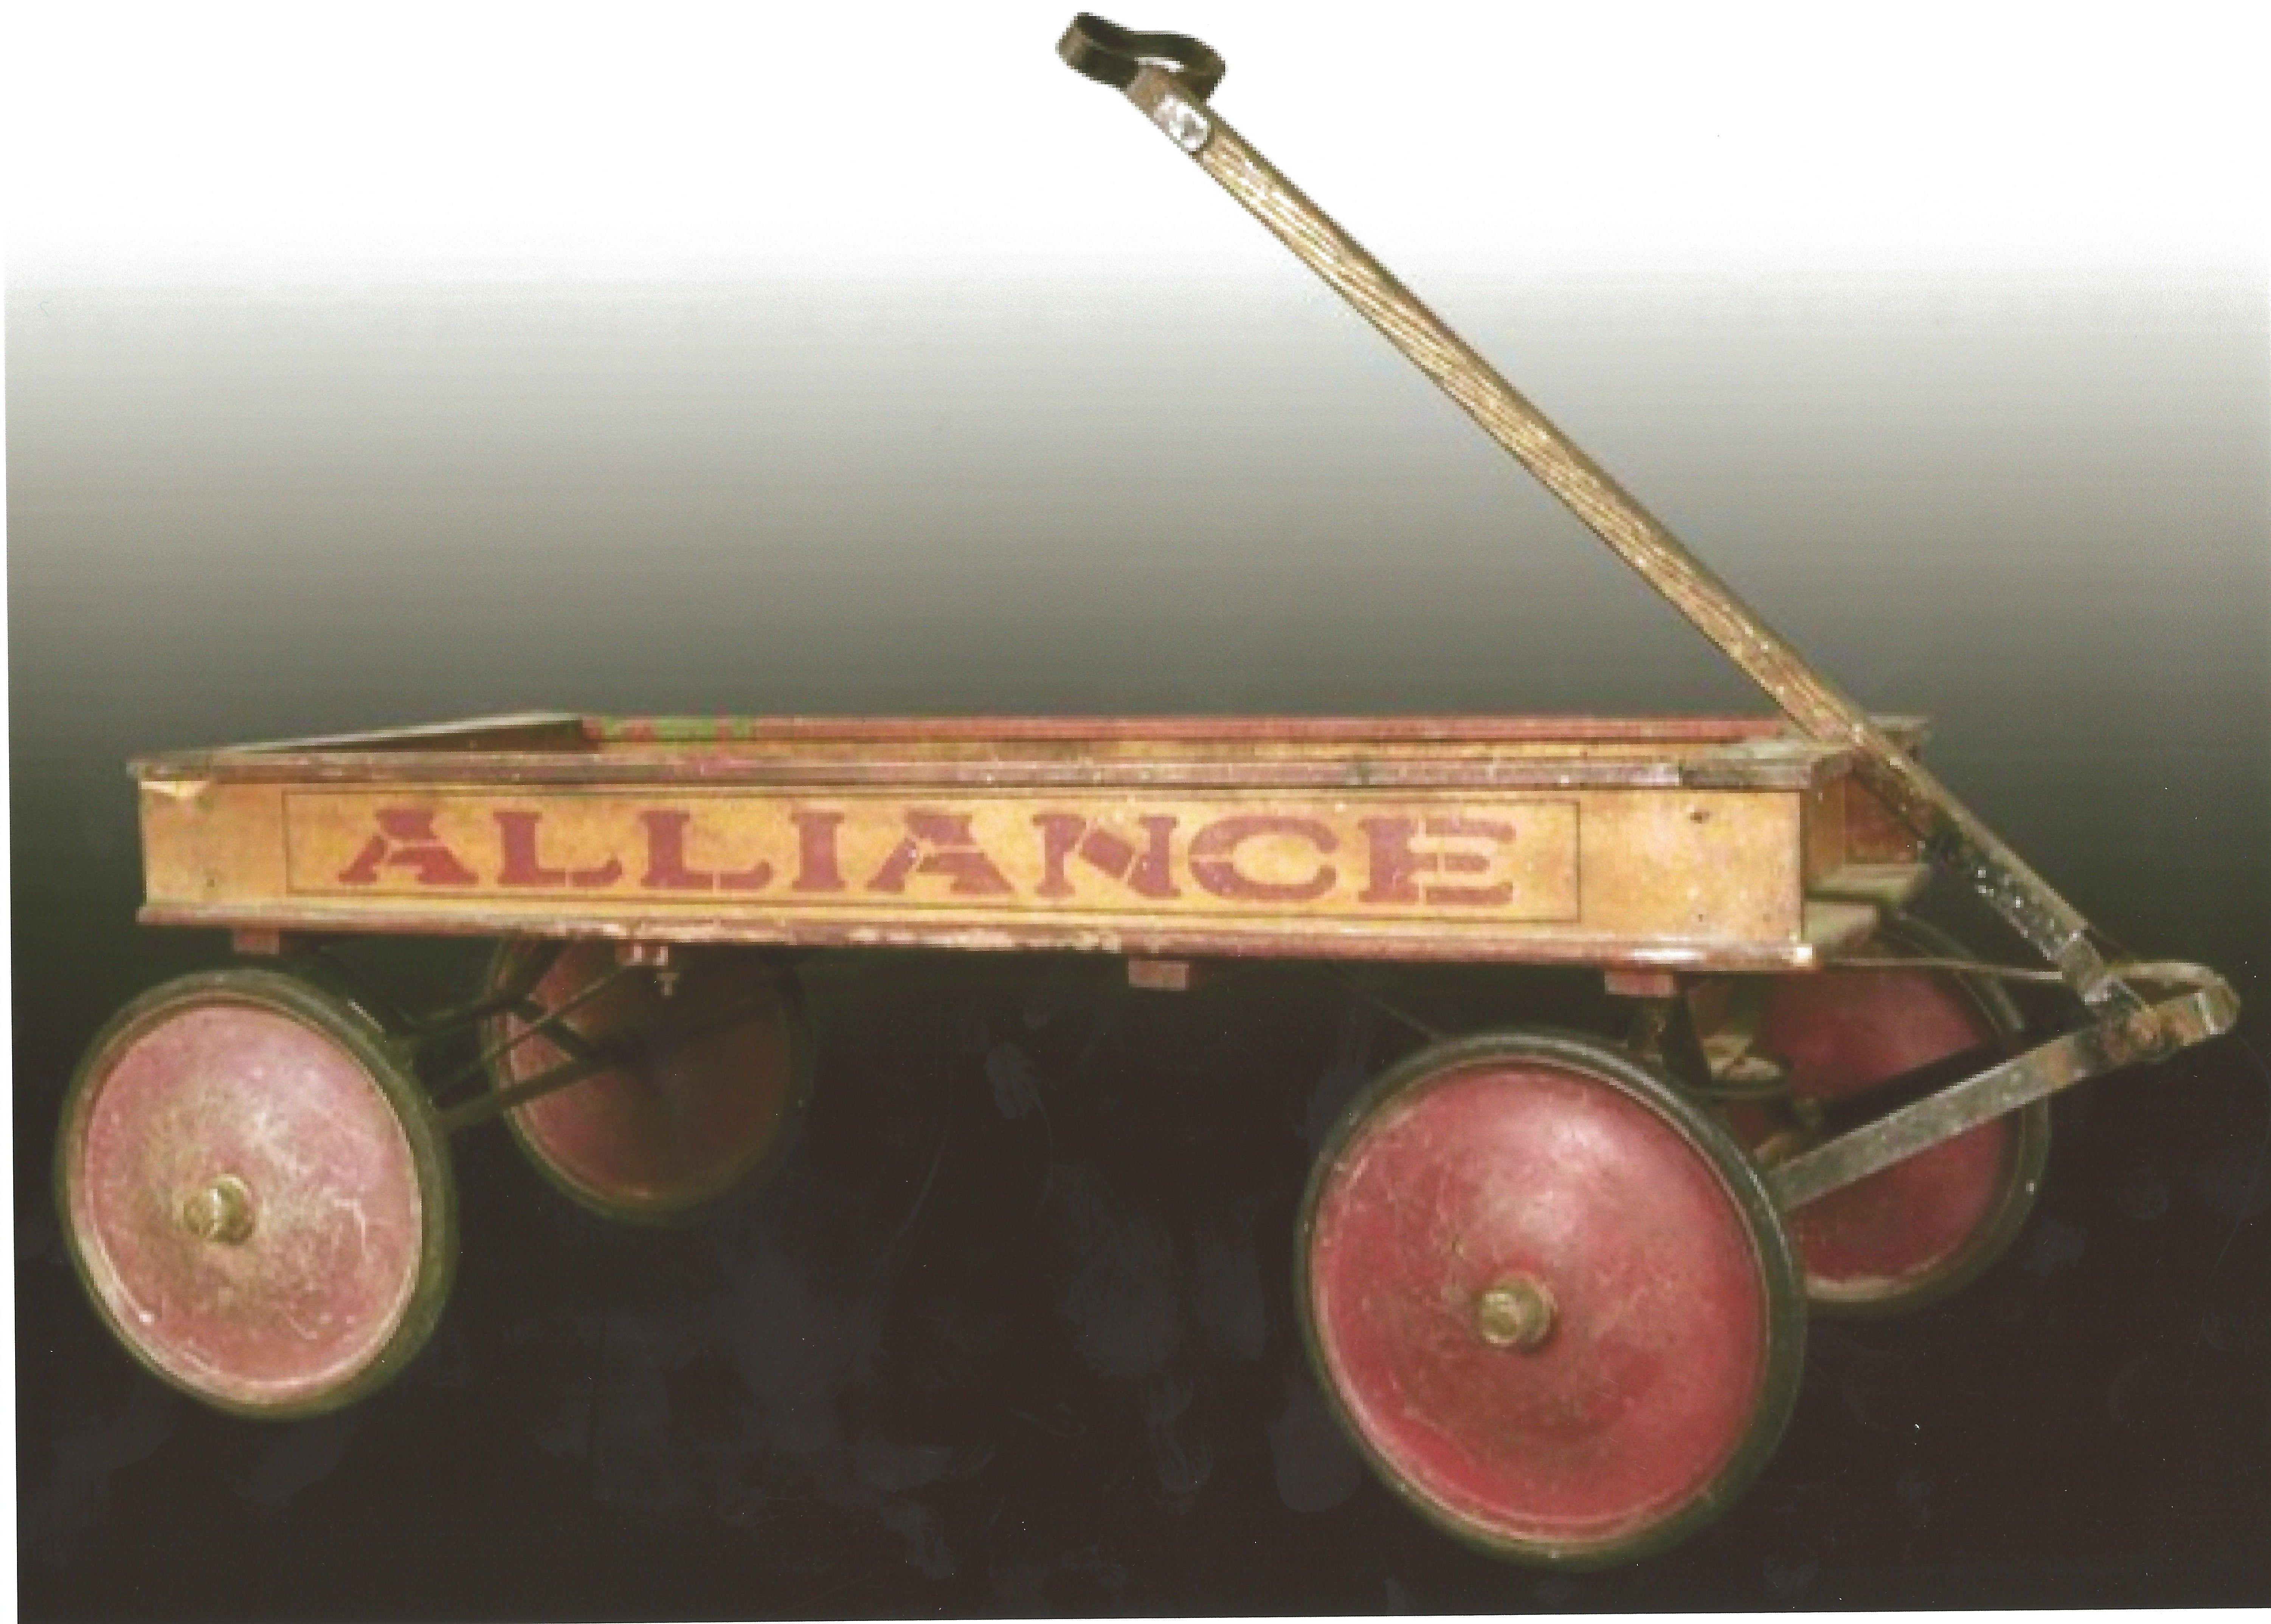 Claasic vintage toys vintage toys second shout out http www - Circa 1925 Alliance Coaster Wagon Paris Mfg Co Antique Toysvintage